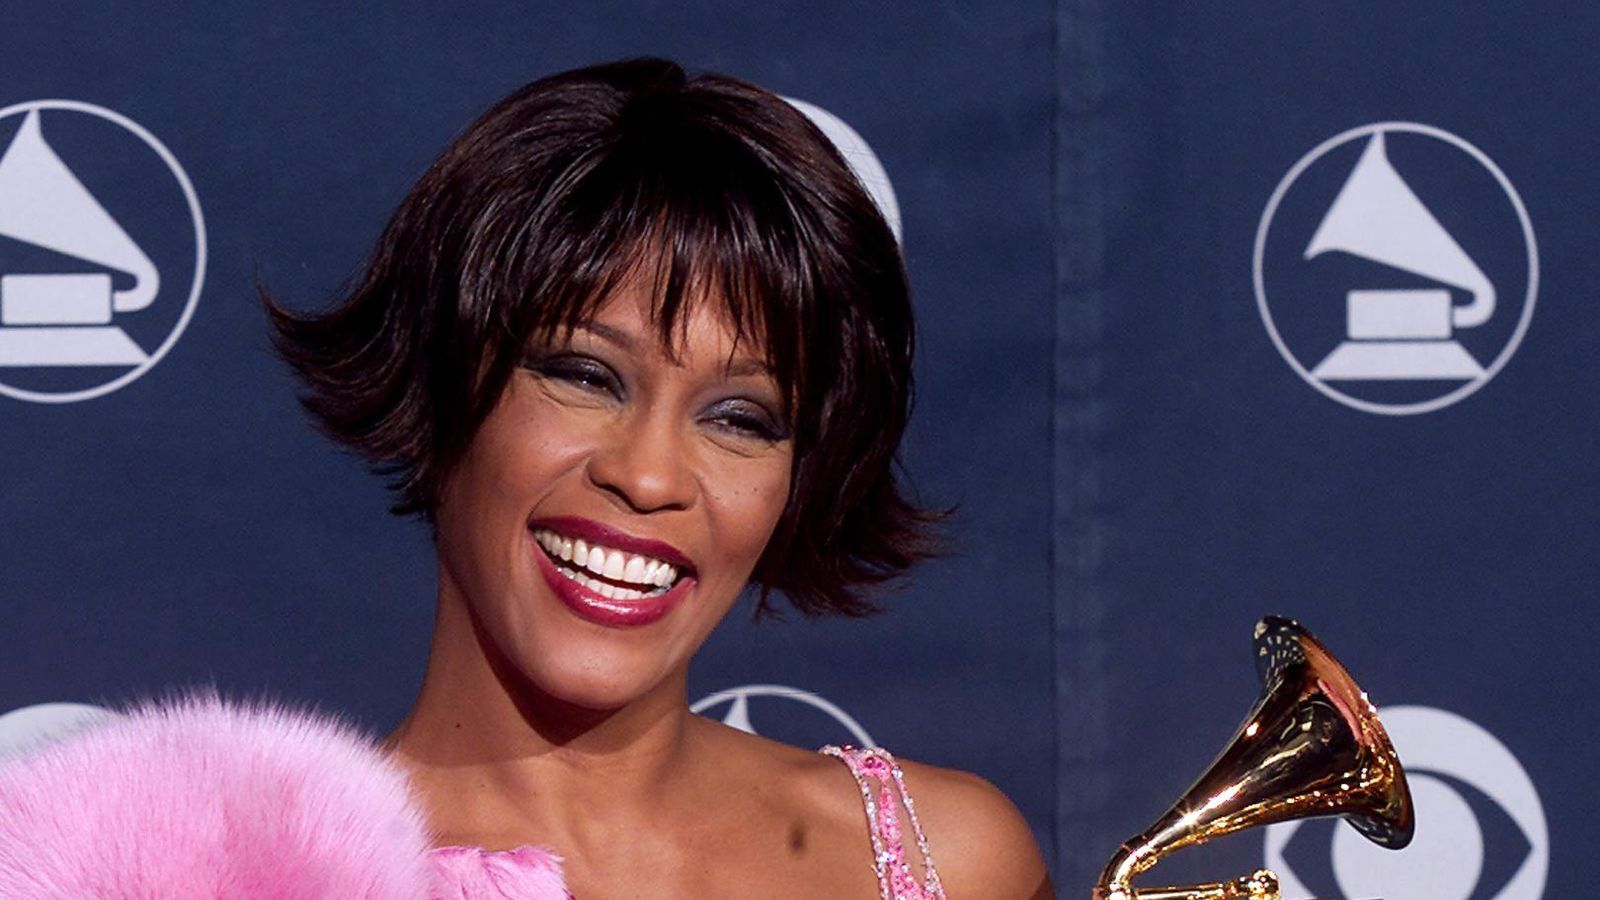 El departament forense de Los Angeles, als EUA, confirma que Whitney Houston va morir ofegada